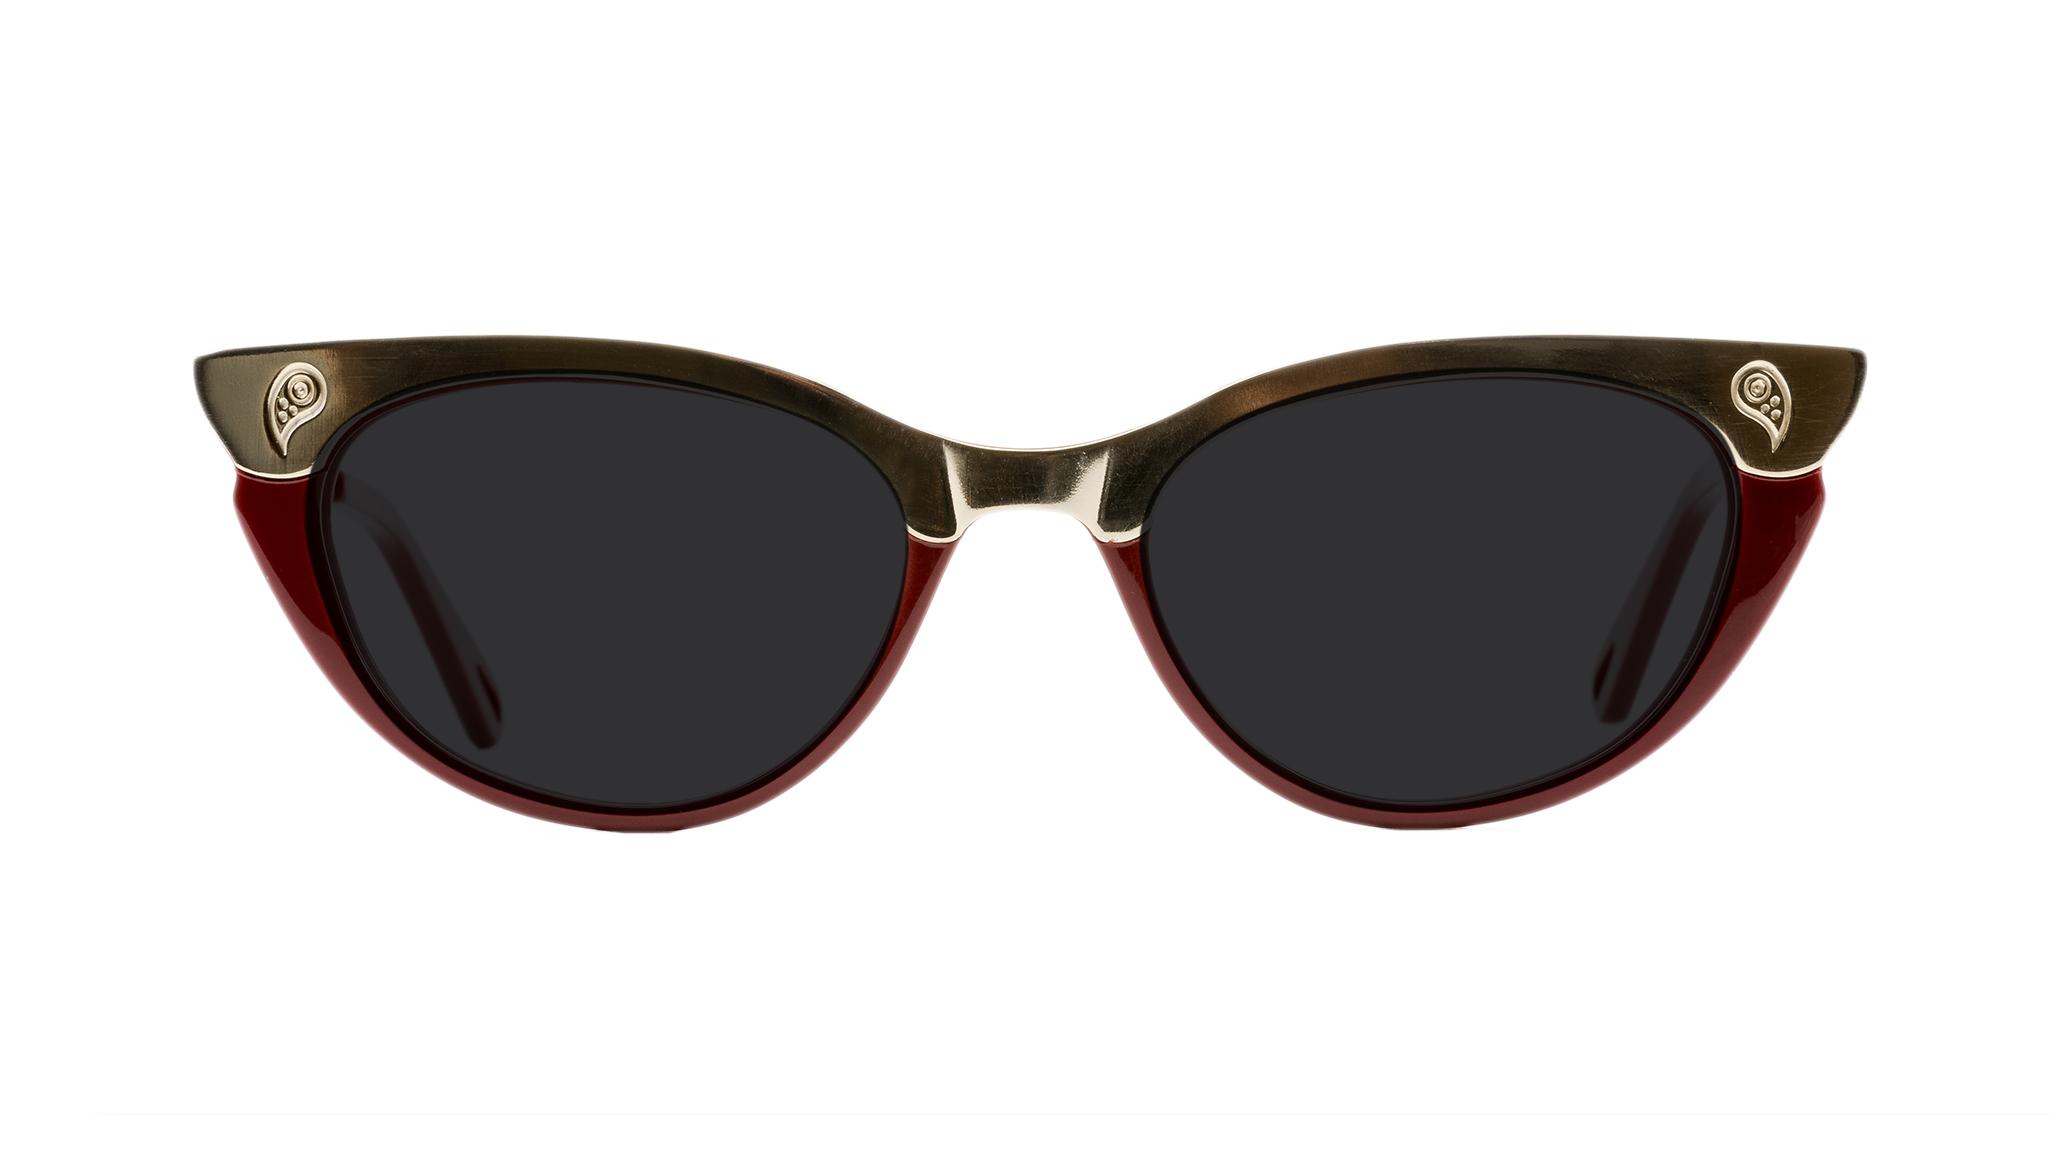 80ef442b7d23 Affordable fashion glasses cat eye daring cateye sunglasses women bad beti  paro front jpg 1600x707 Bad